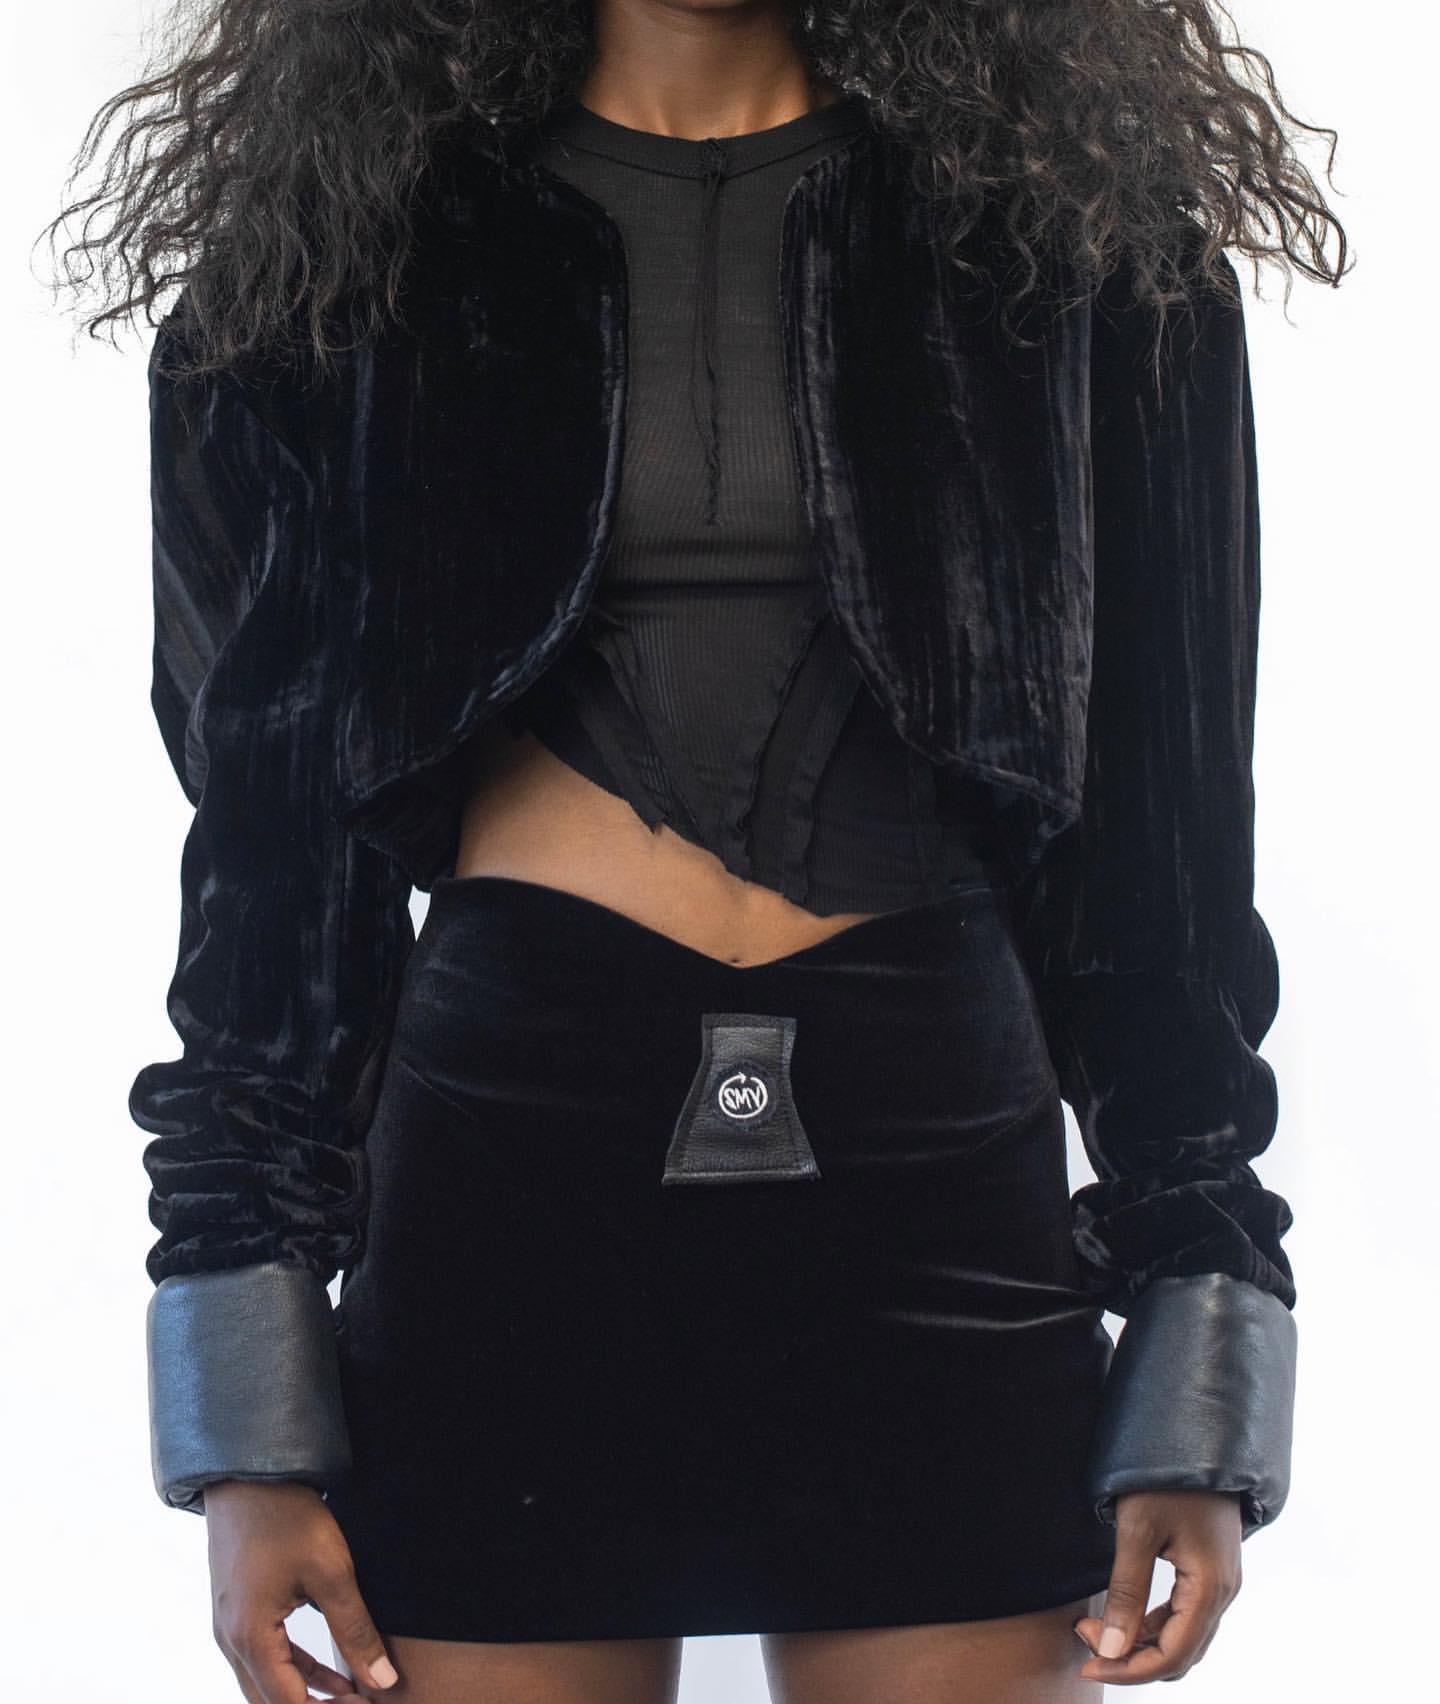 jacket top skirt